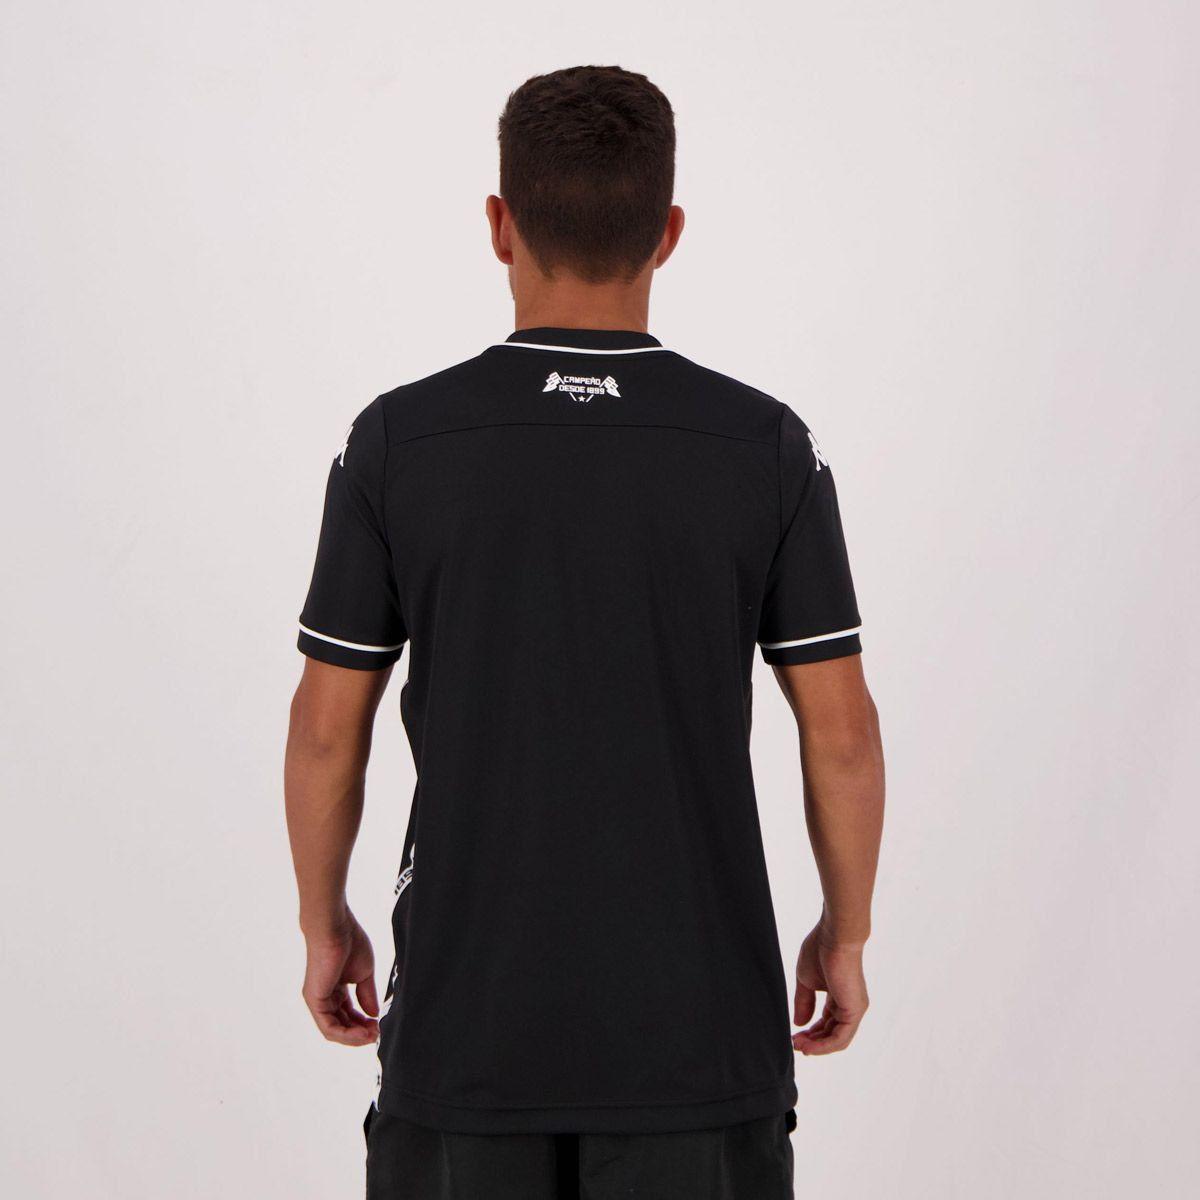 Camisa Kappa Botafogo II 2019